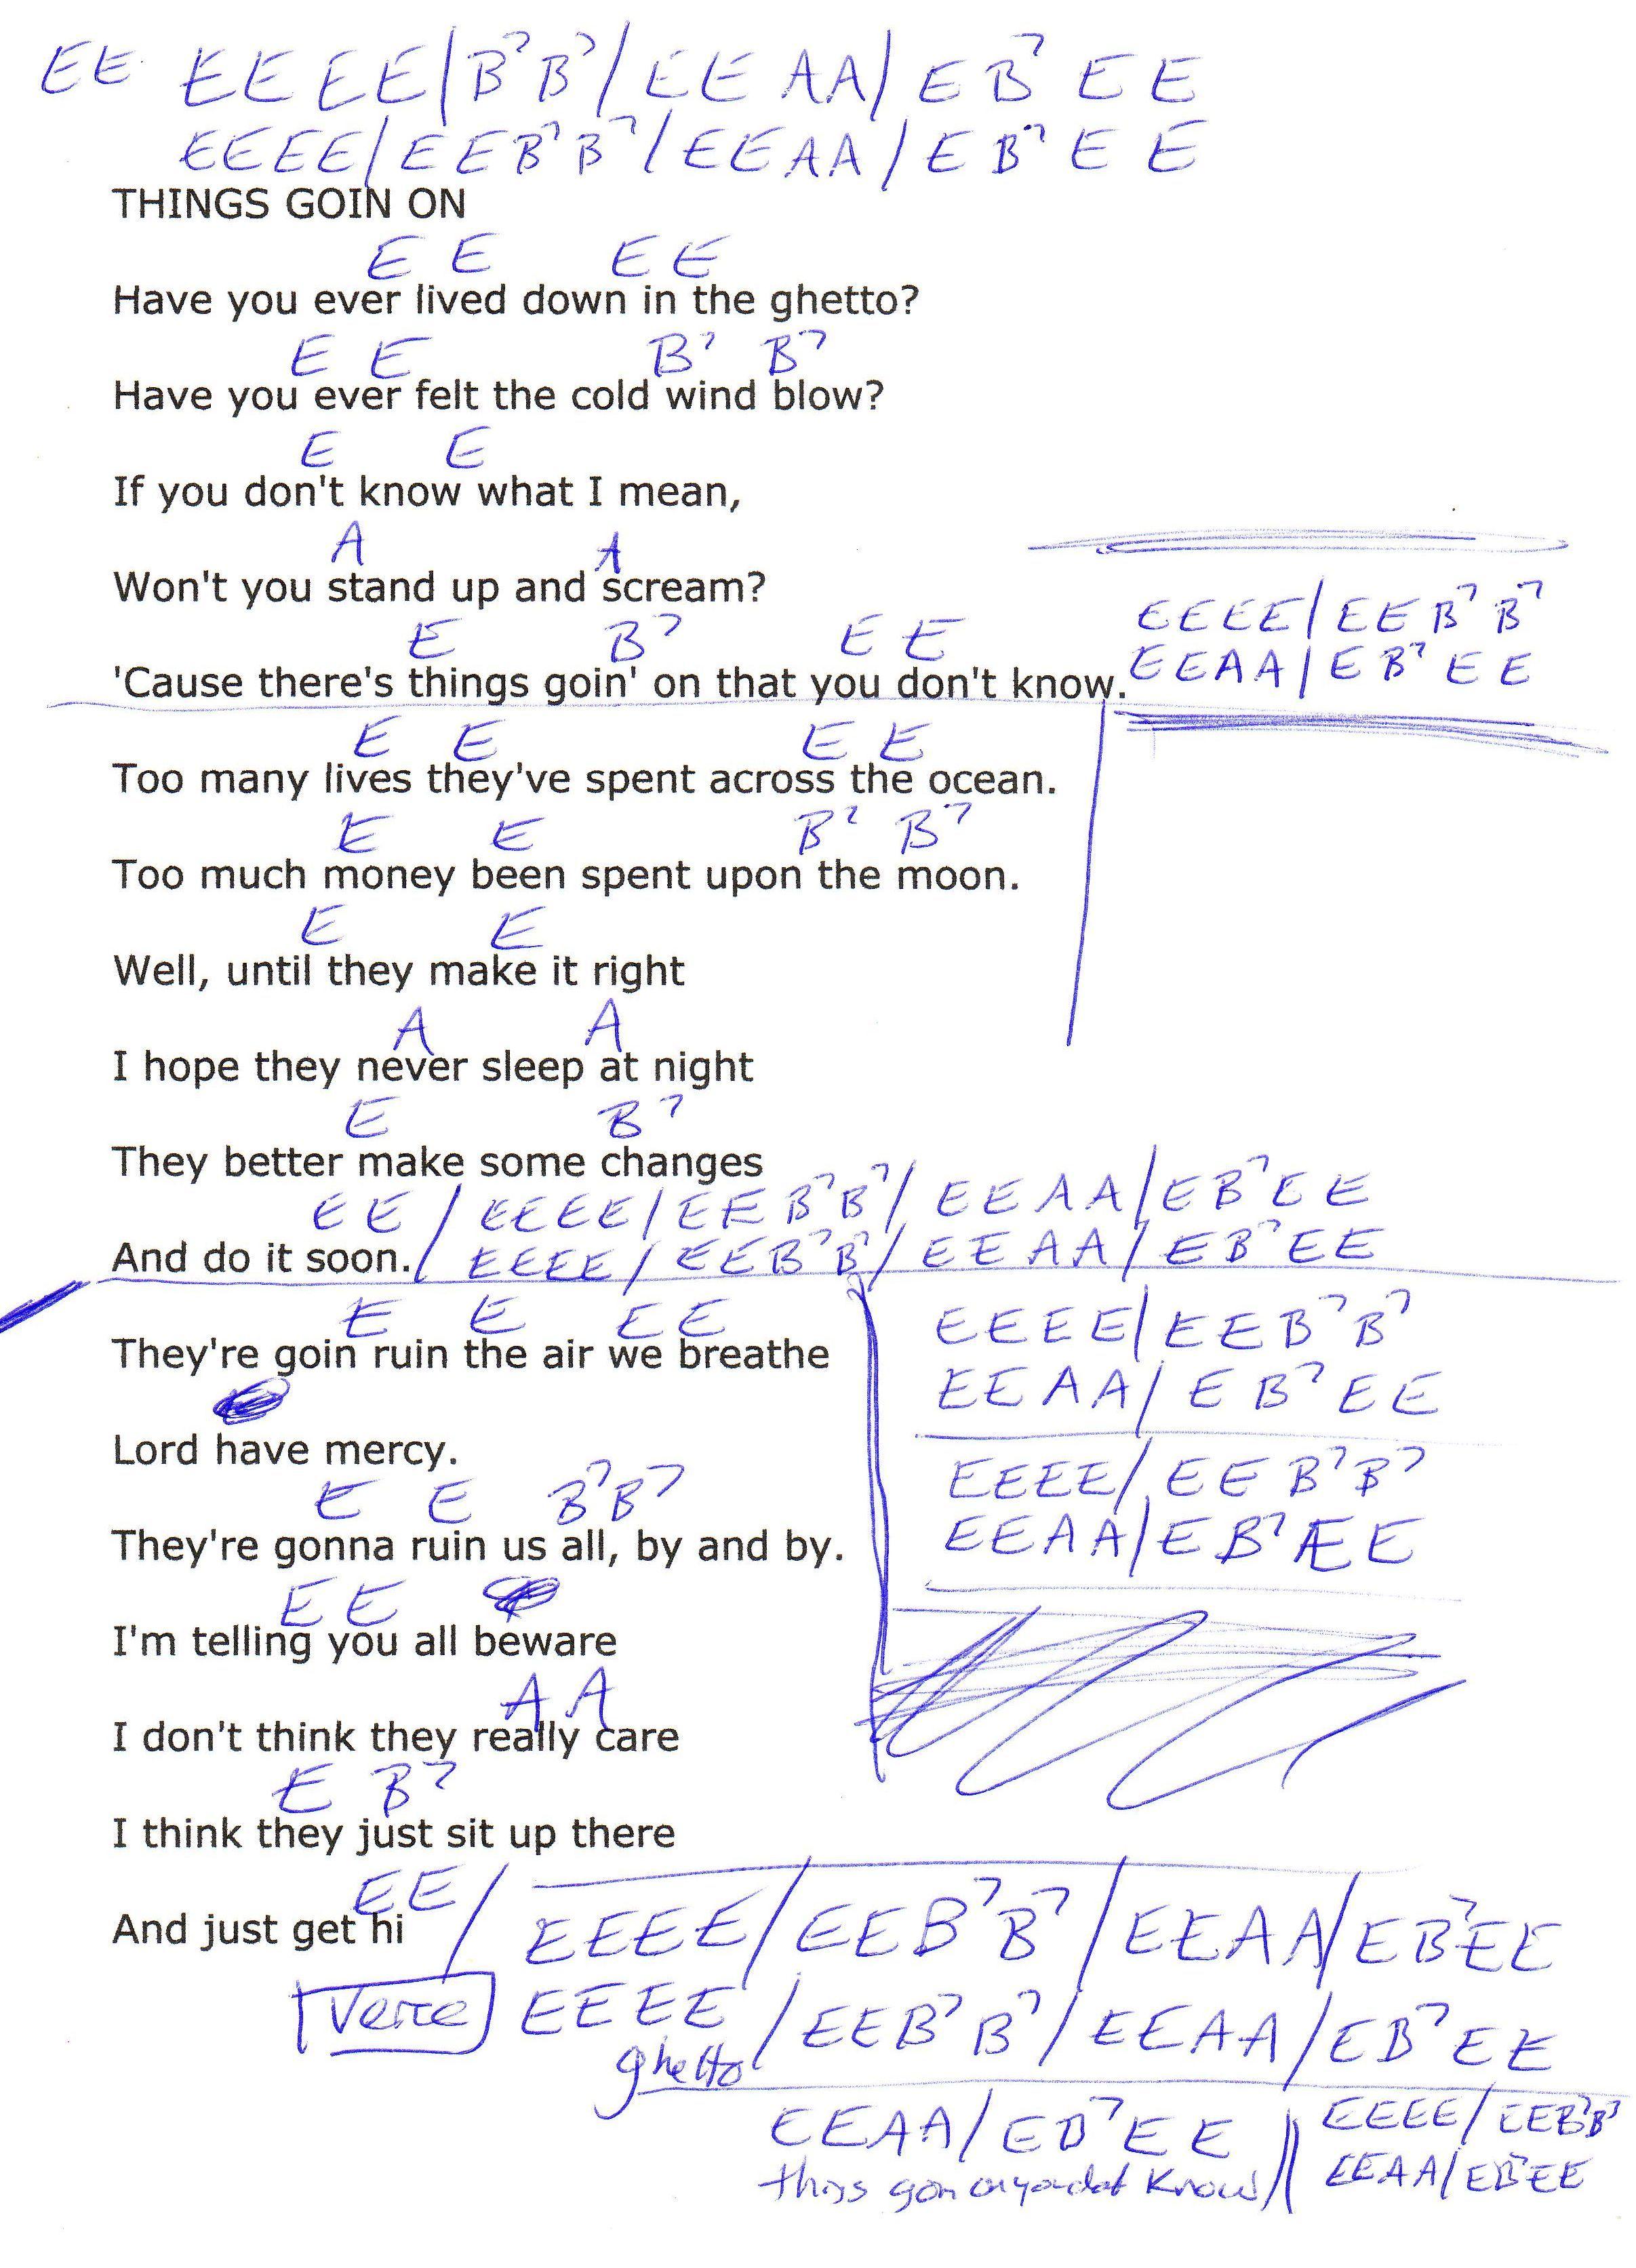 Things Goin On Lynyrd Skynyrd Guitar Chord Chart Guitar Lesson